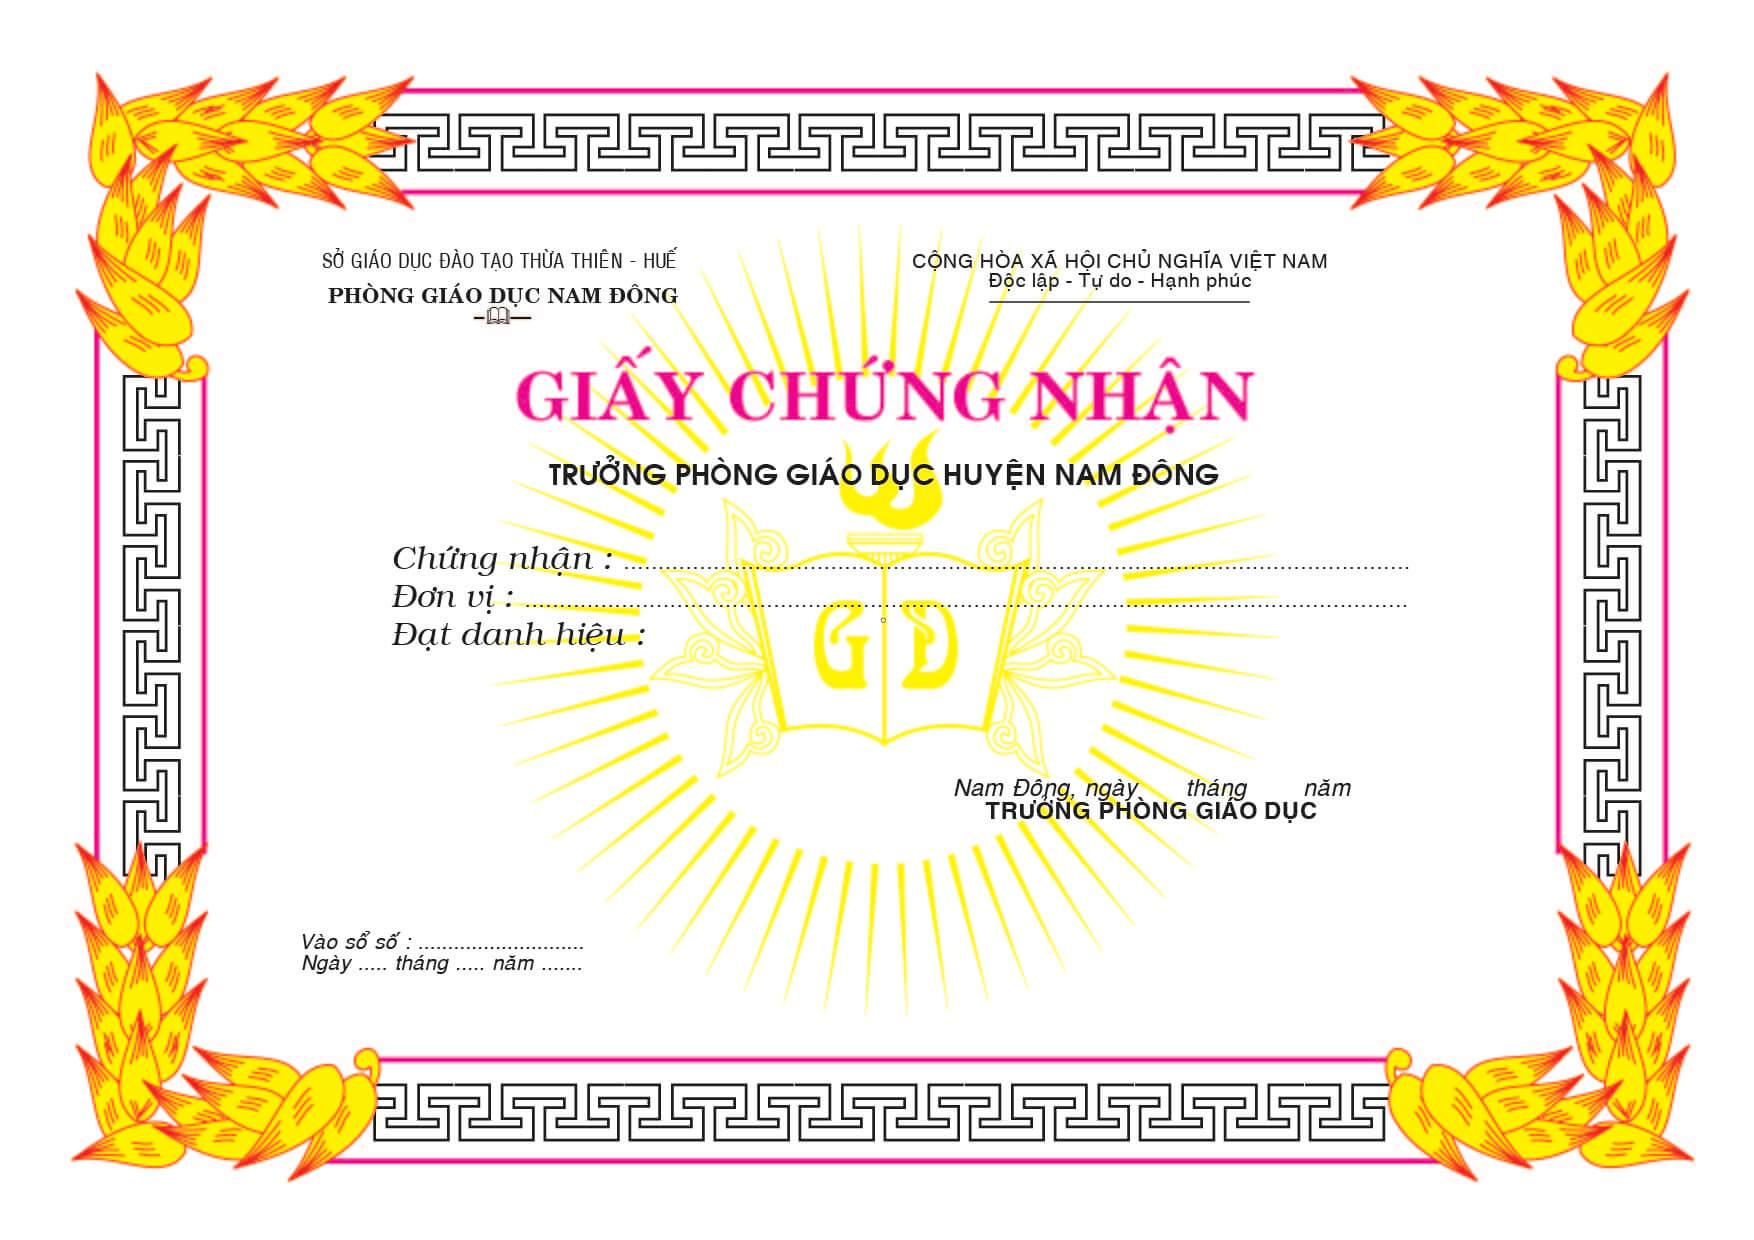 Mẫu giấy khen 022 - mẫu giấy khen phòng giáo dục - Link Download : https://adsnew.net/MwZ092ee